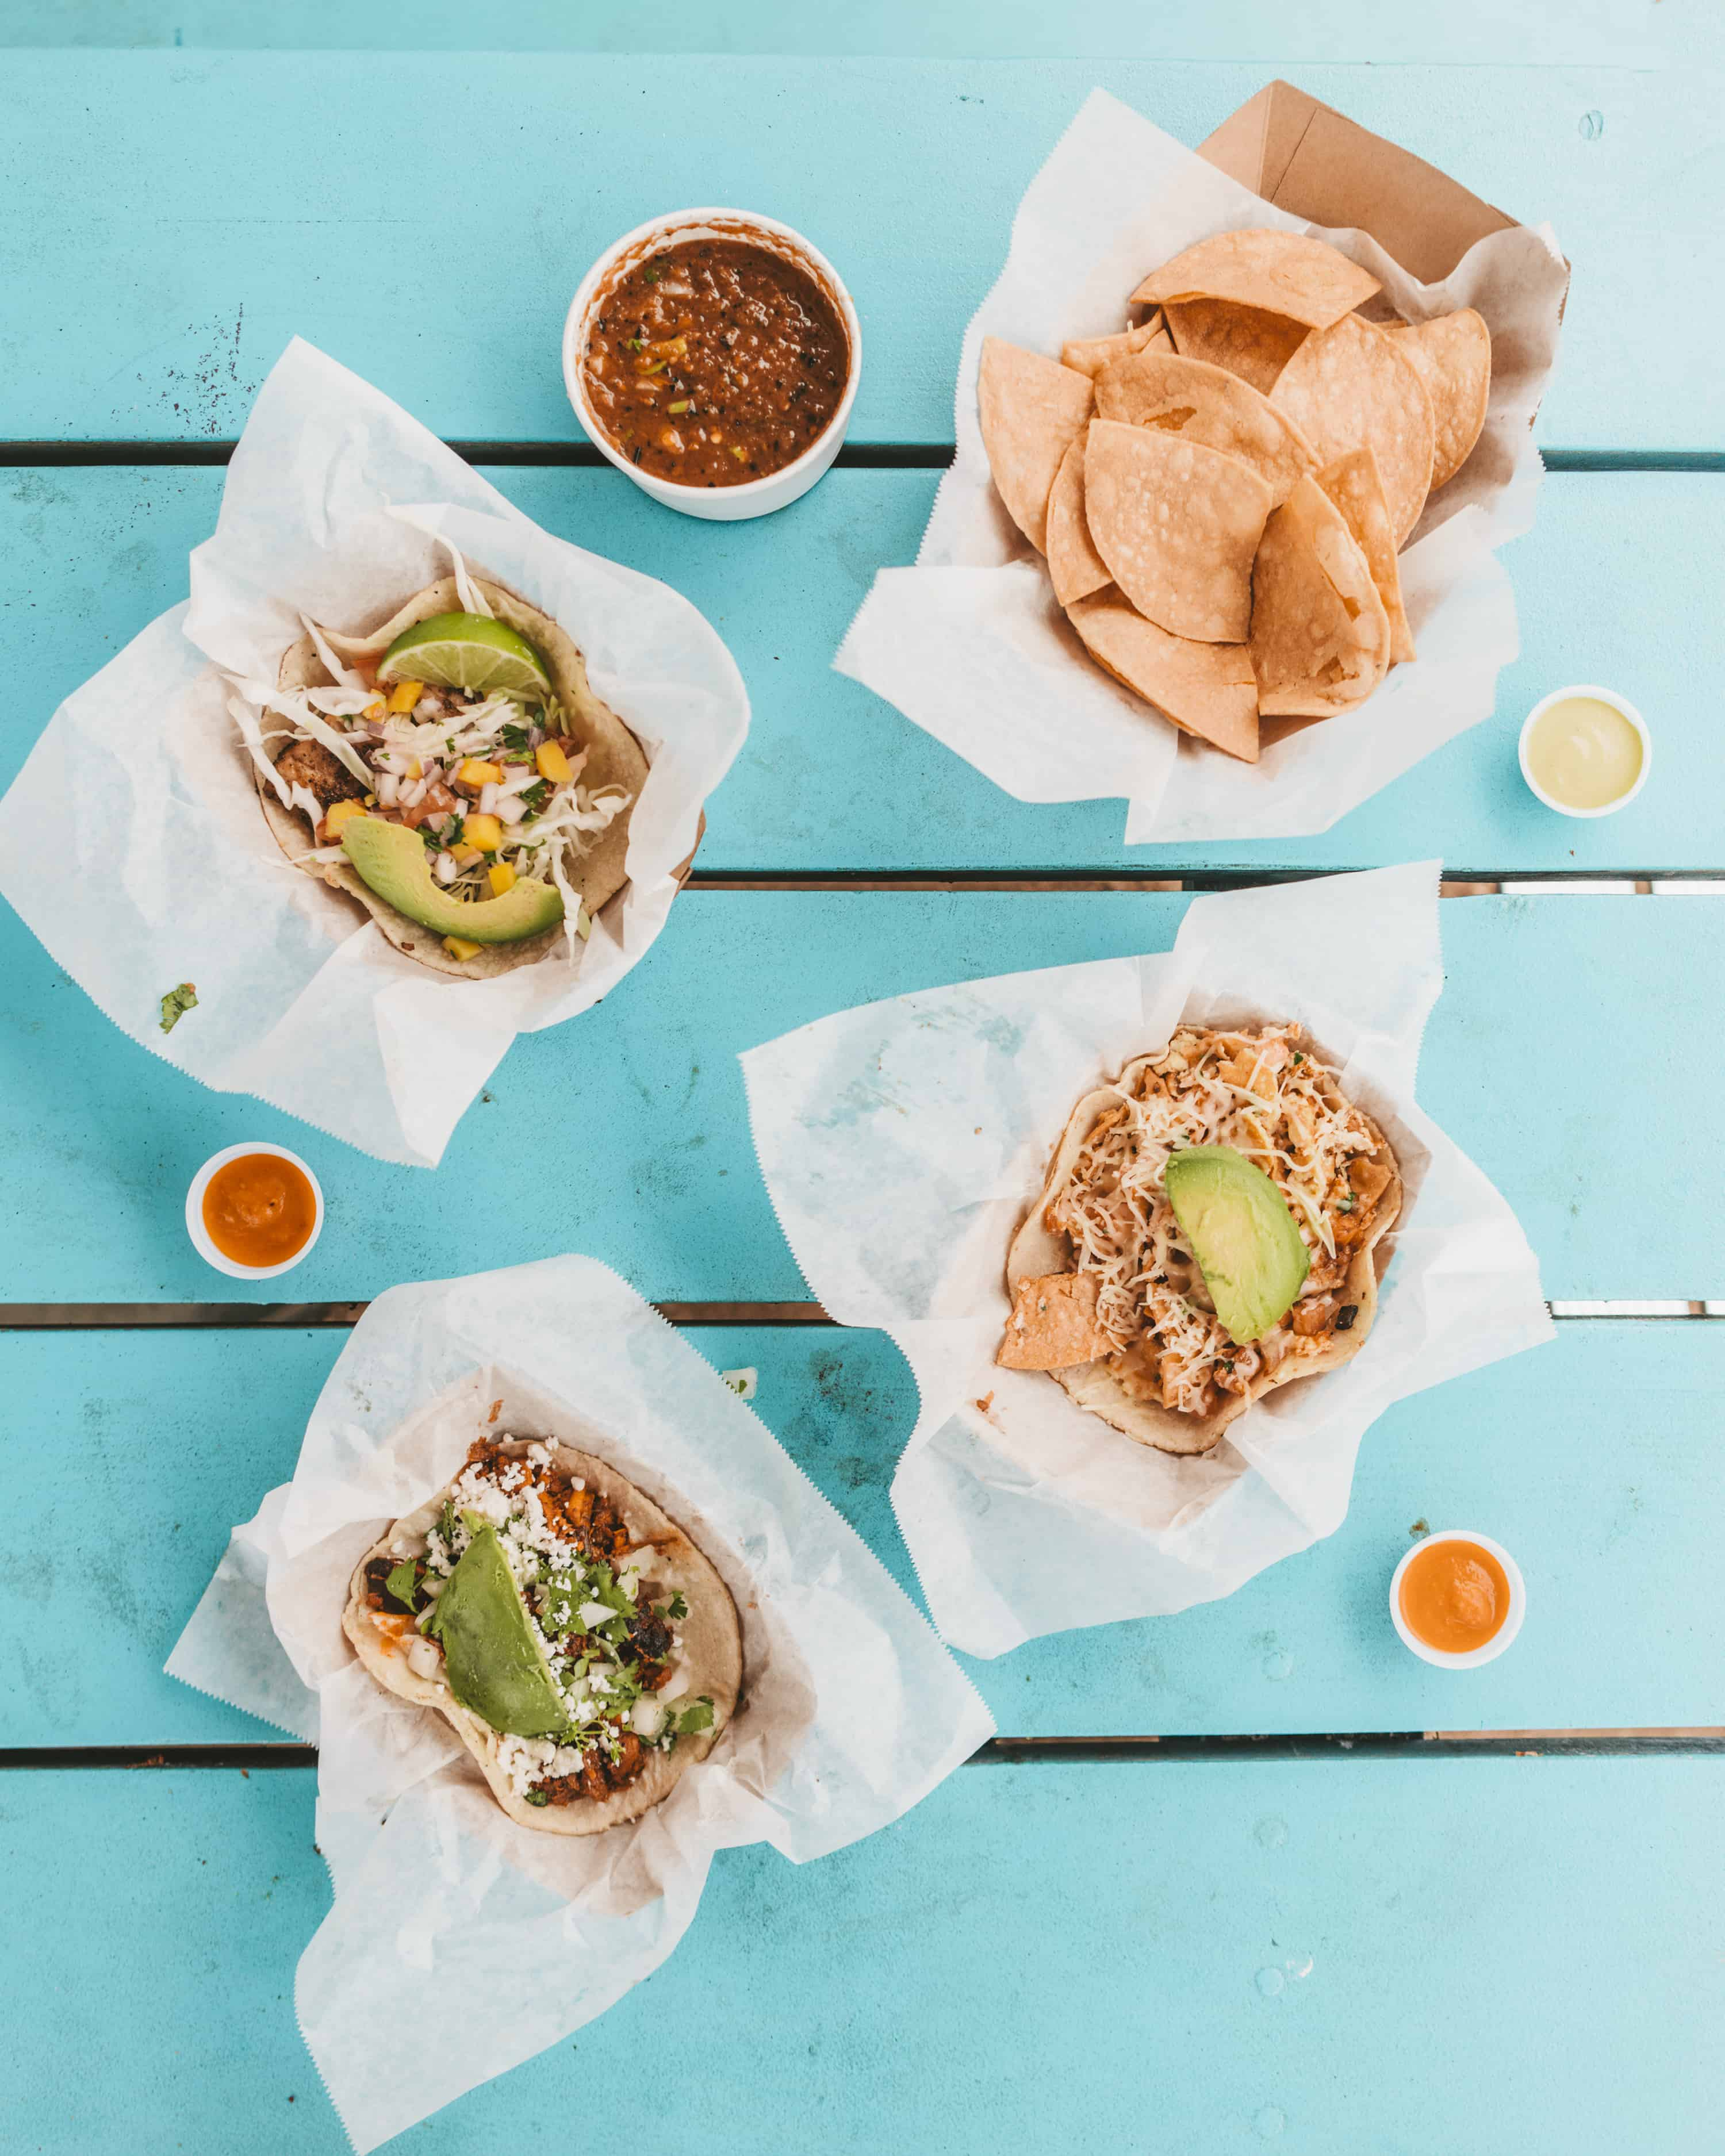 Veracruz Breakfast Tacos in Austin Texas